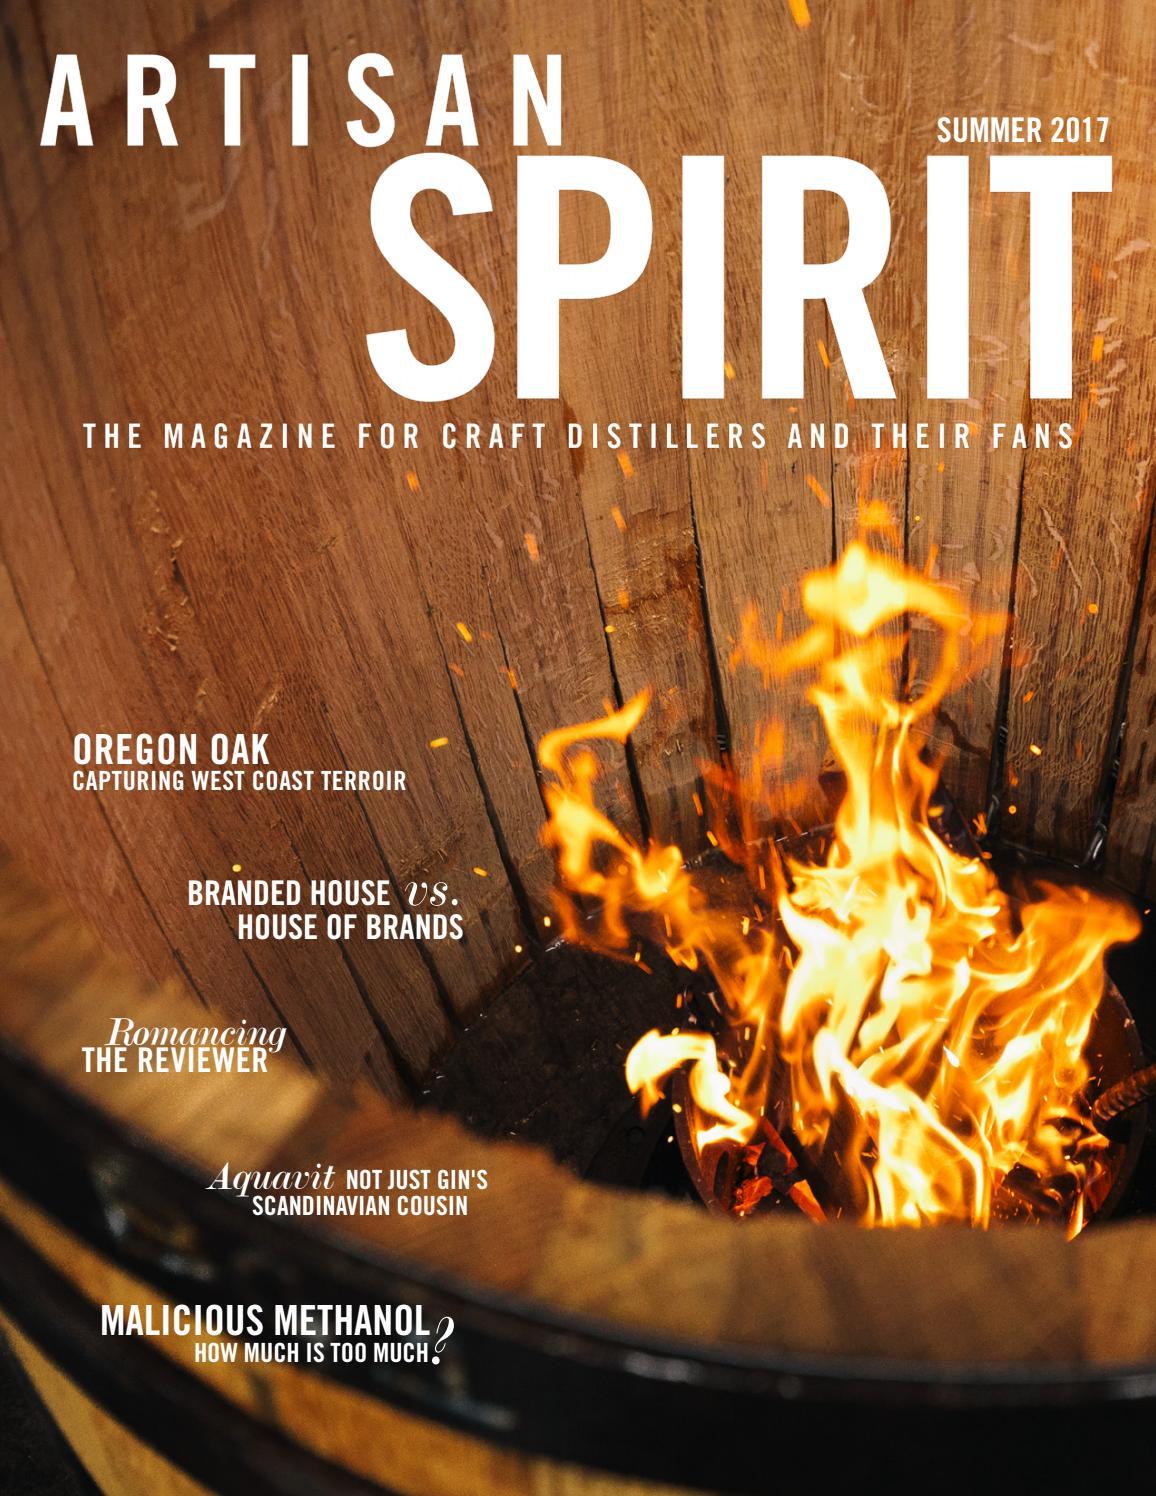 Aphrodisiac The Sexual Secret Of Marijuana 1971 artisan spirit: summer 2017artisan spirit magazine - issuu